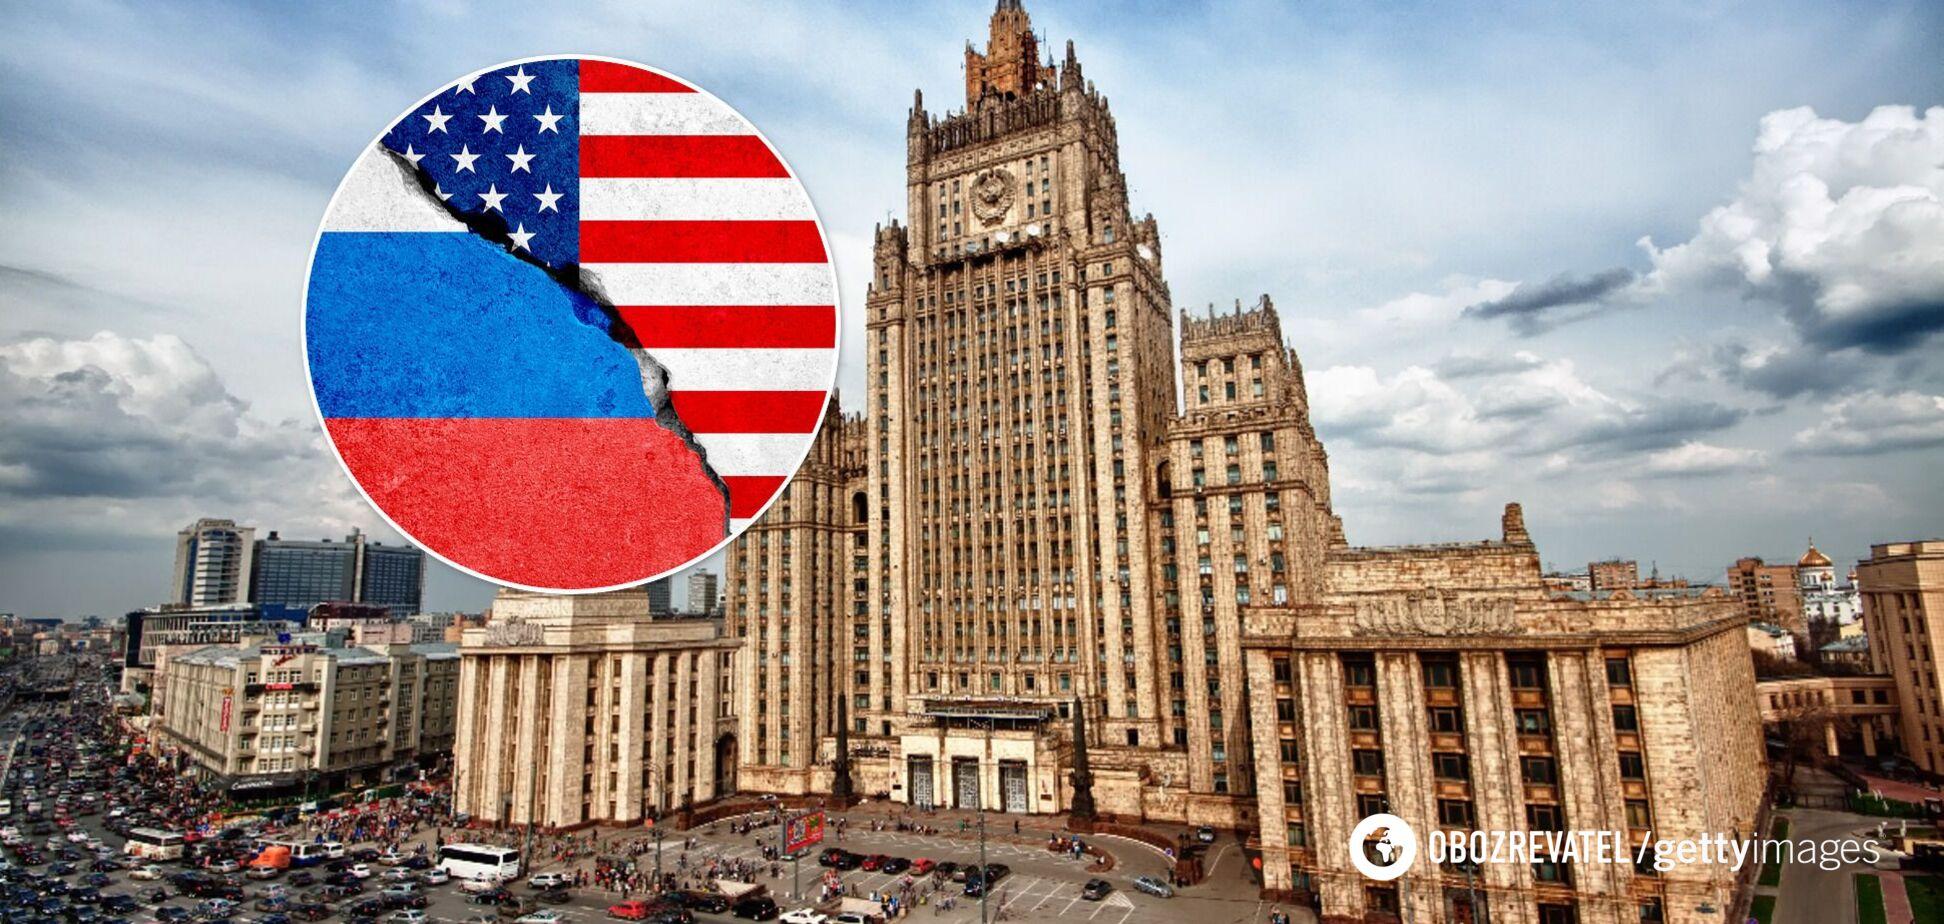 Дипломата з посольства США терміново викликали в МЗС Росії